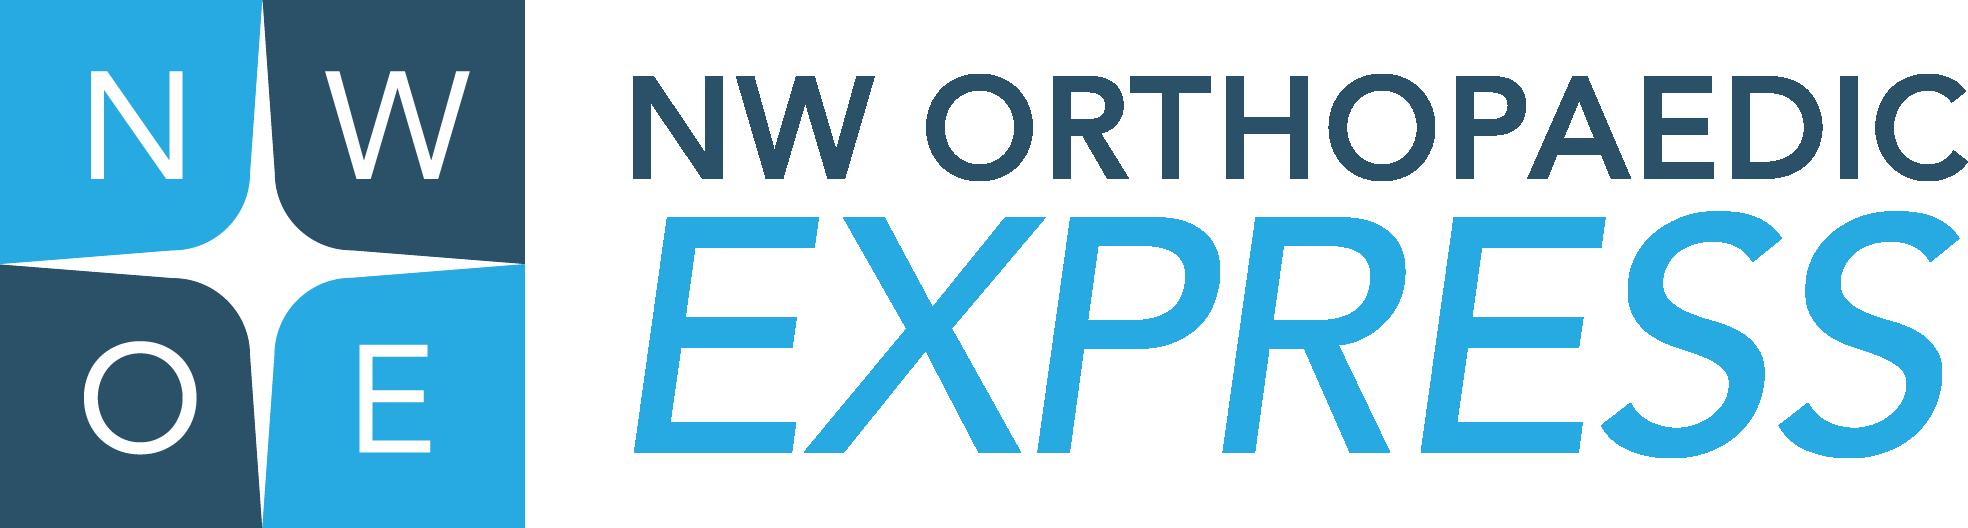 Home» Northwest Orthopaedic Specialists, Spokane, WA